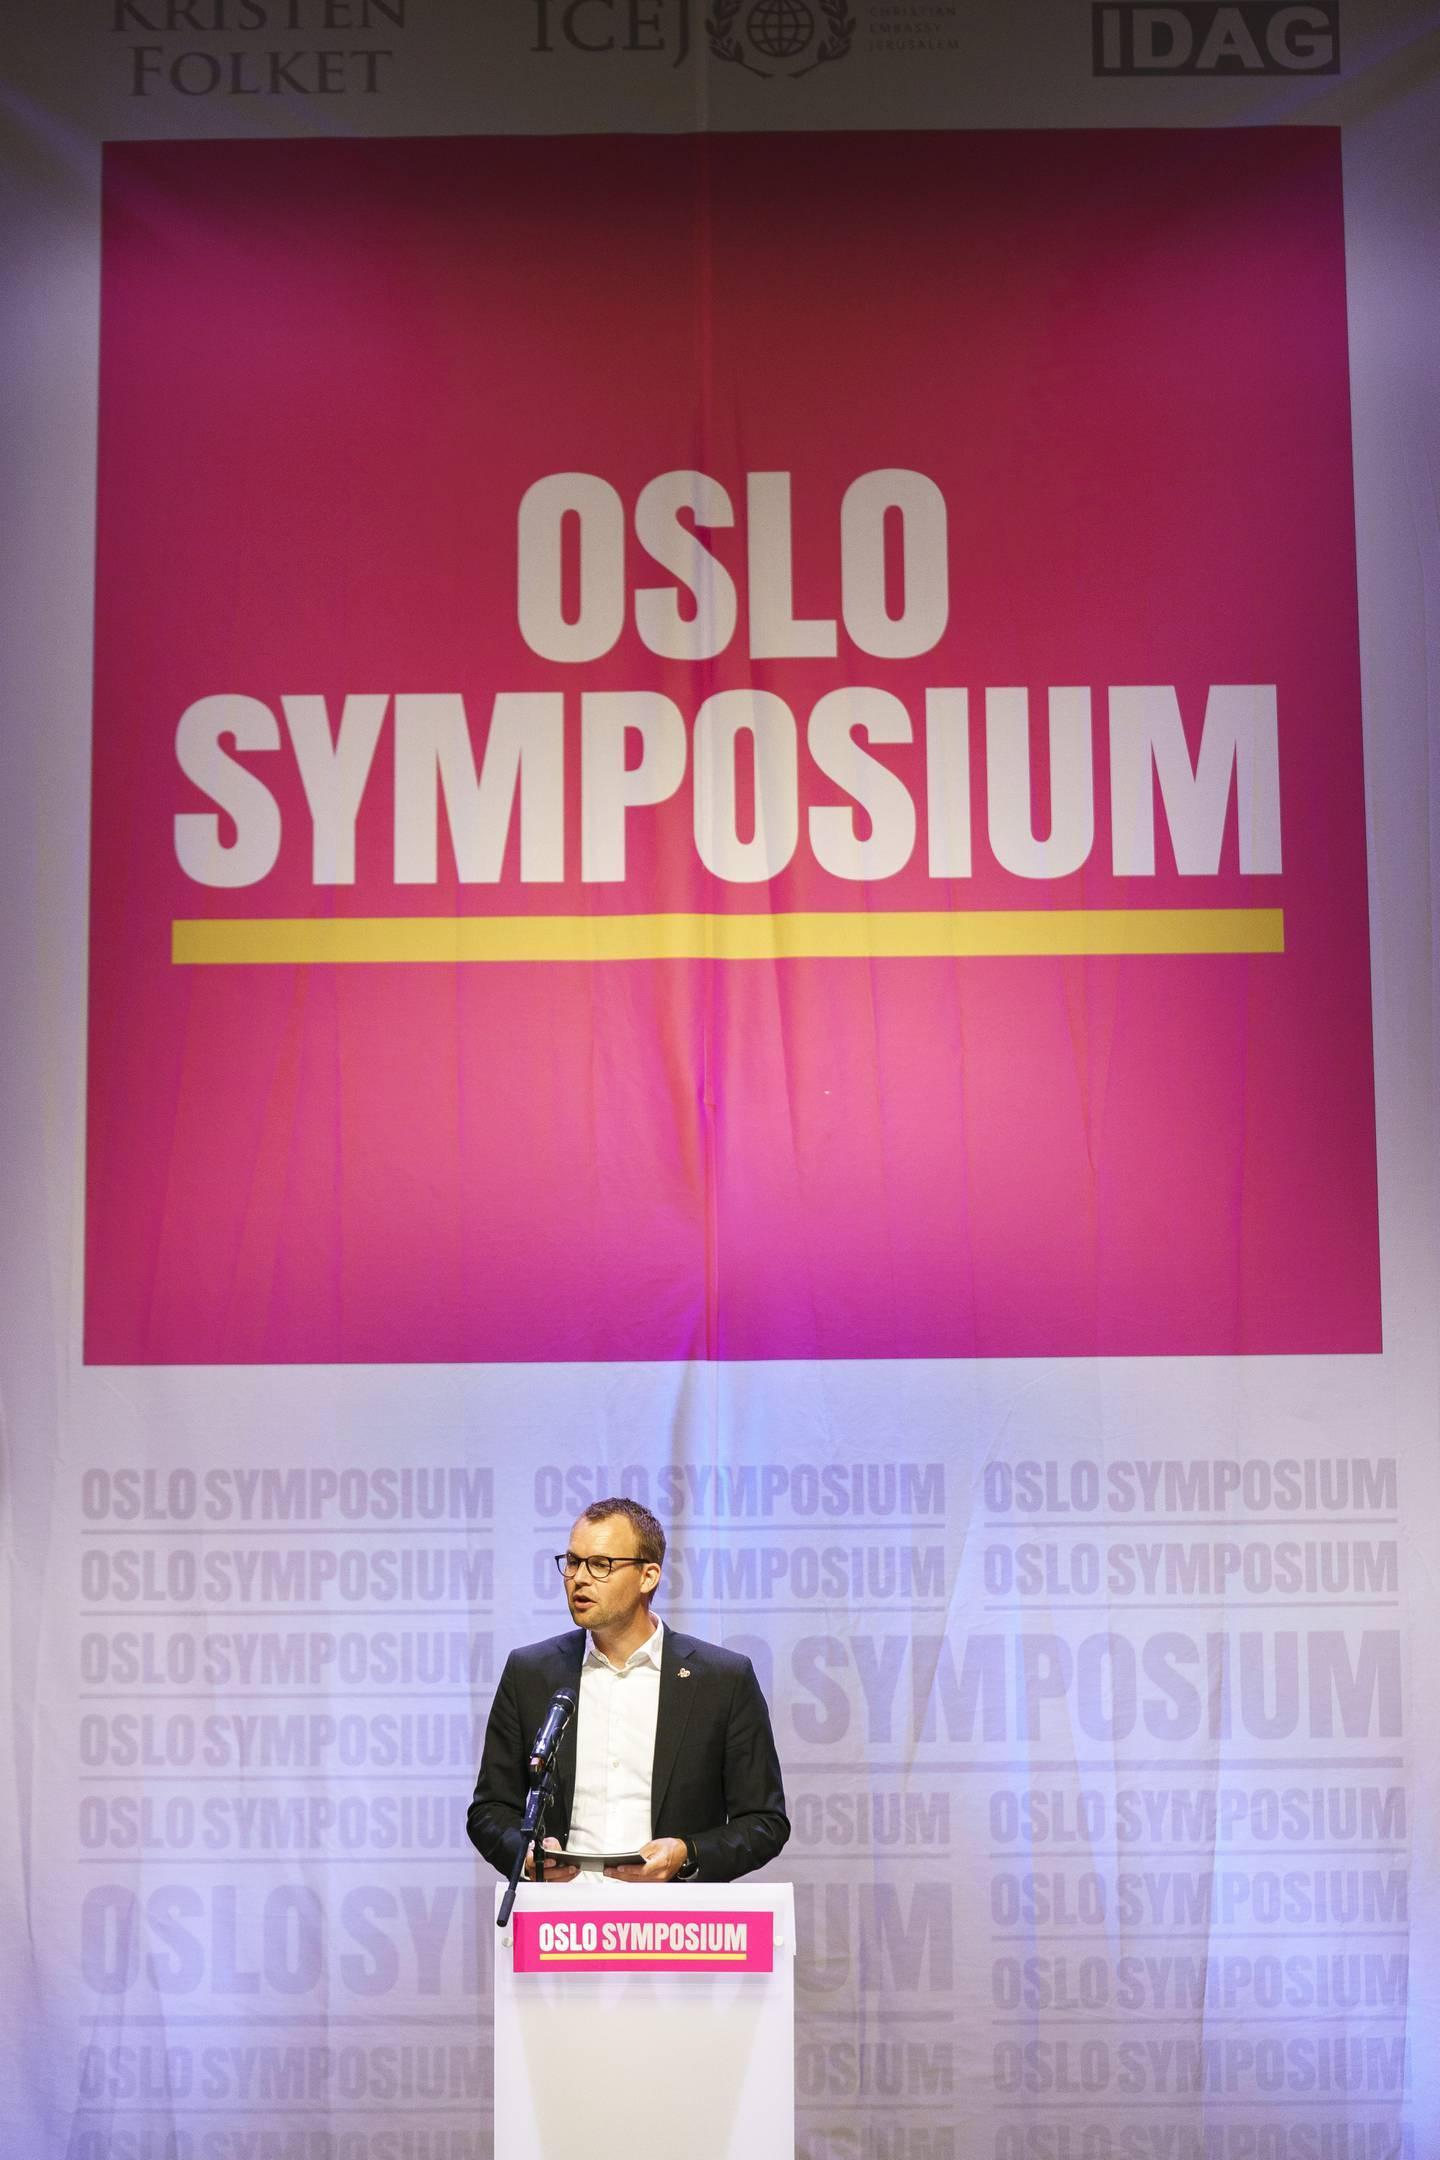 Oslo symposium 2021